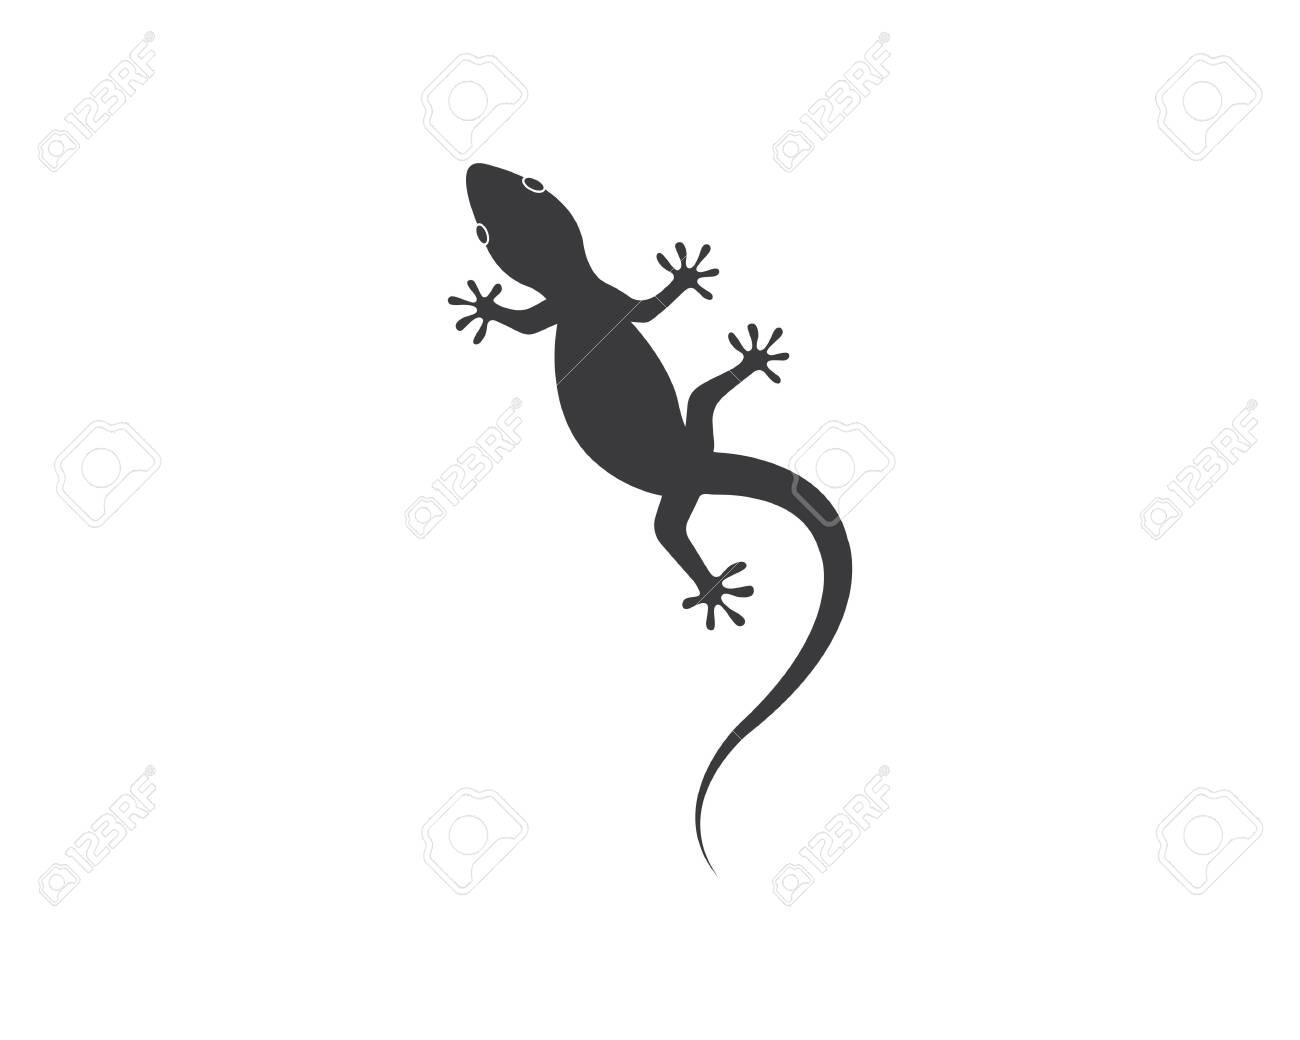 Lizard vector illustration logo template - 121102028